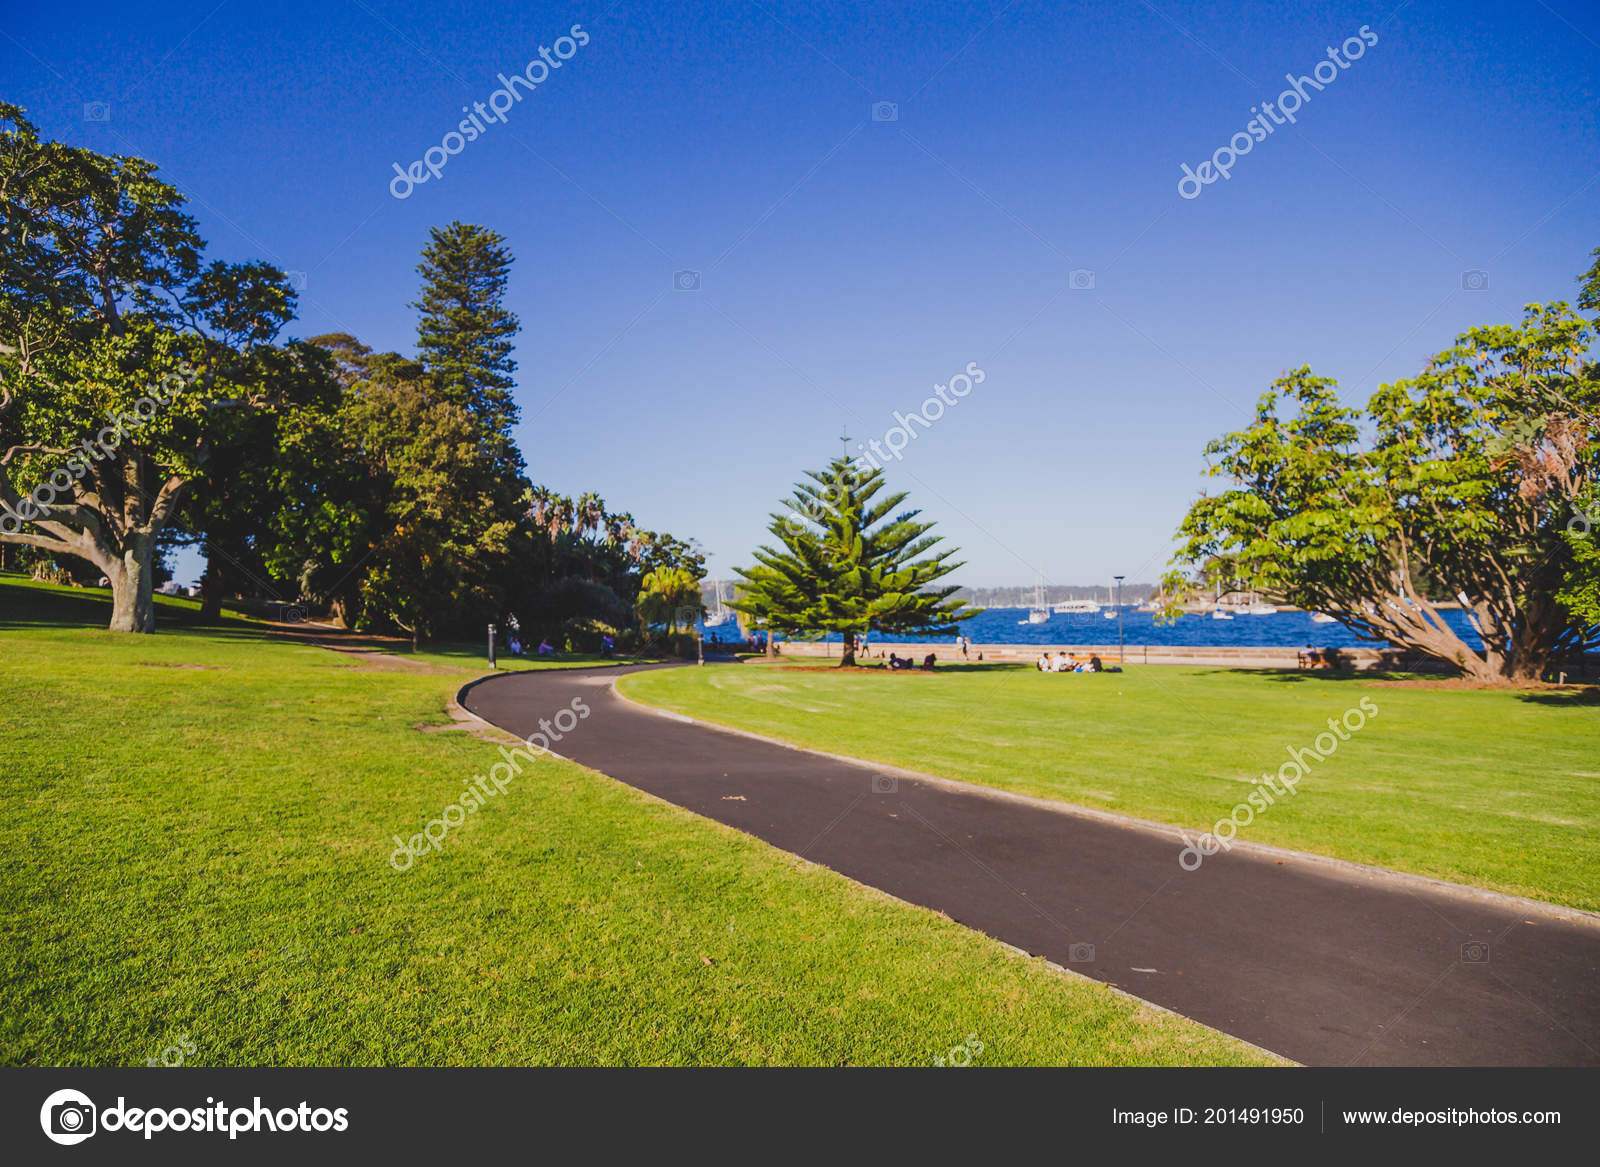 Sydney Australia December 30Th 2014 Detail Royal Botanic